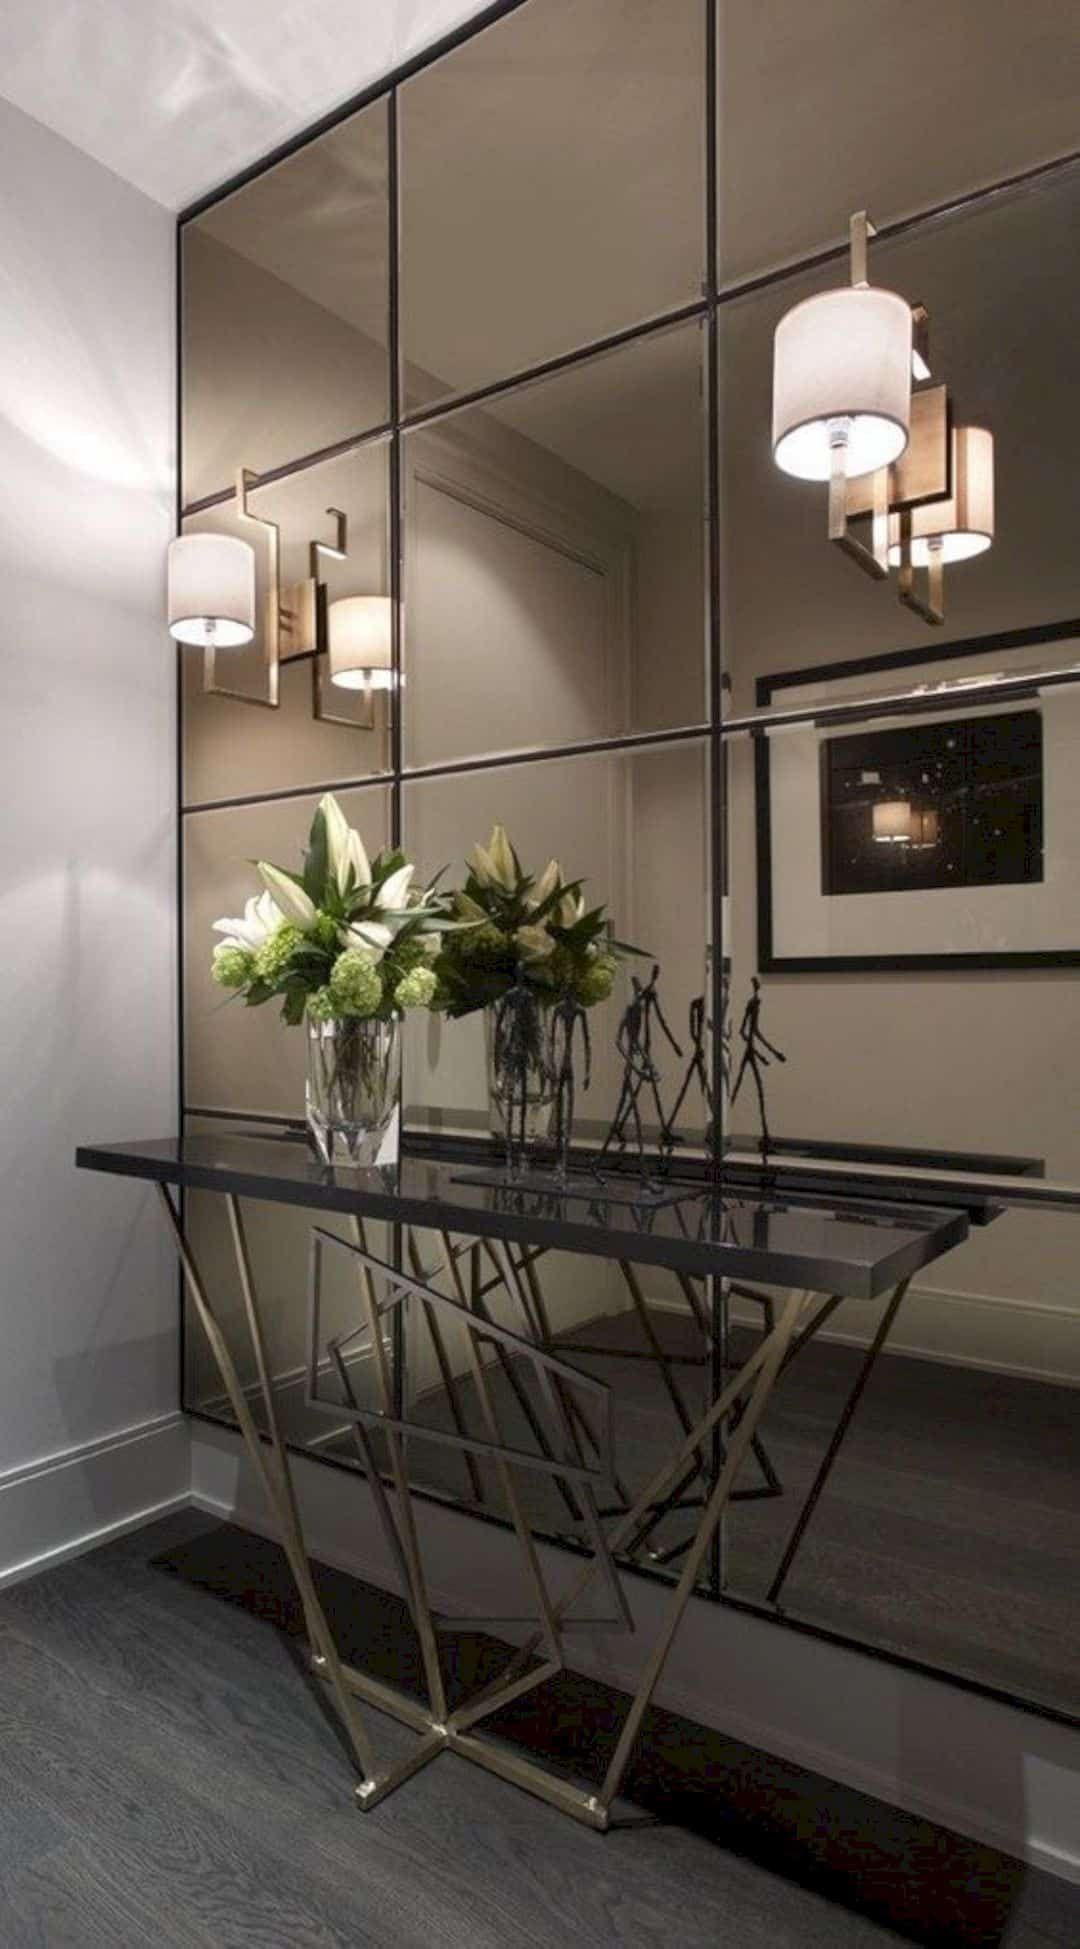 20 Awesome Modern Interior Design Ideas